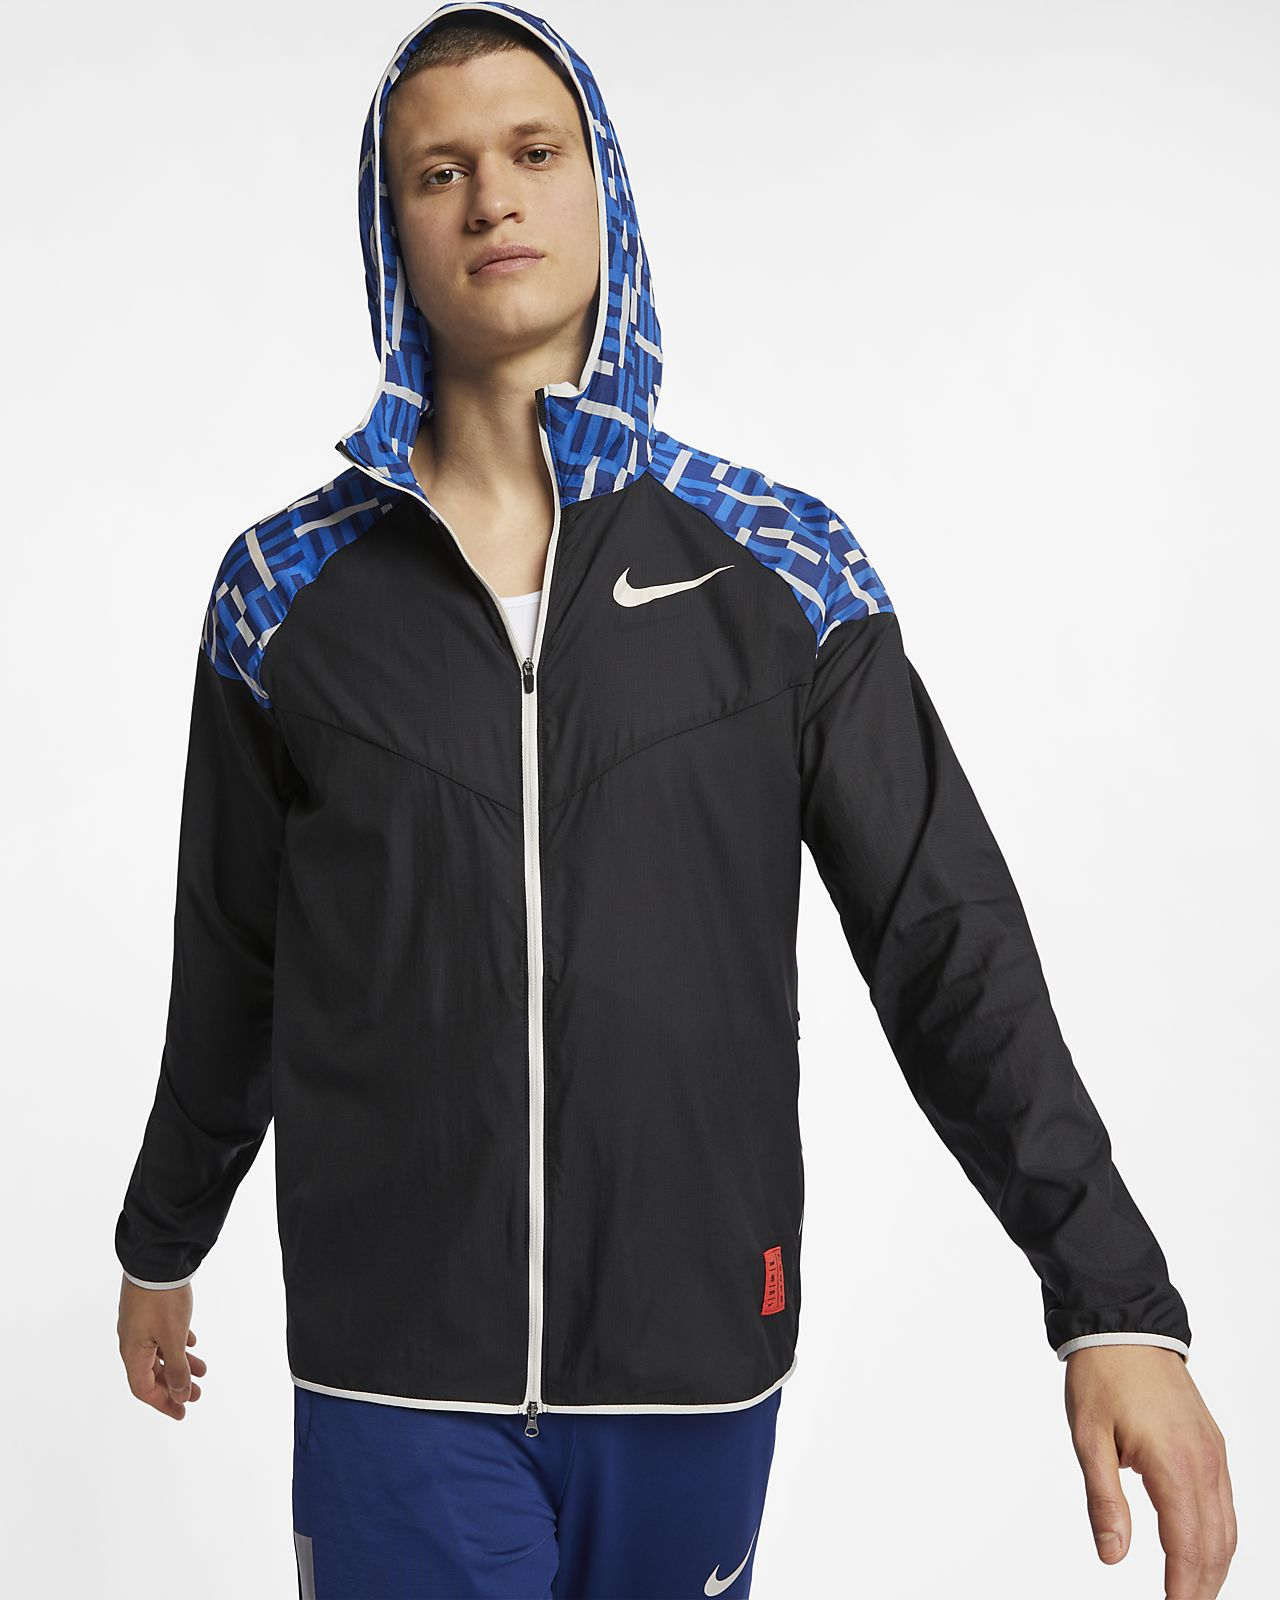 finest selection 0dabe 21b1e Low Resolution Nike Windrunner Hardloopjack voor heren Nike Windrunner  Hardloopjack voor heren